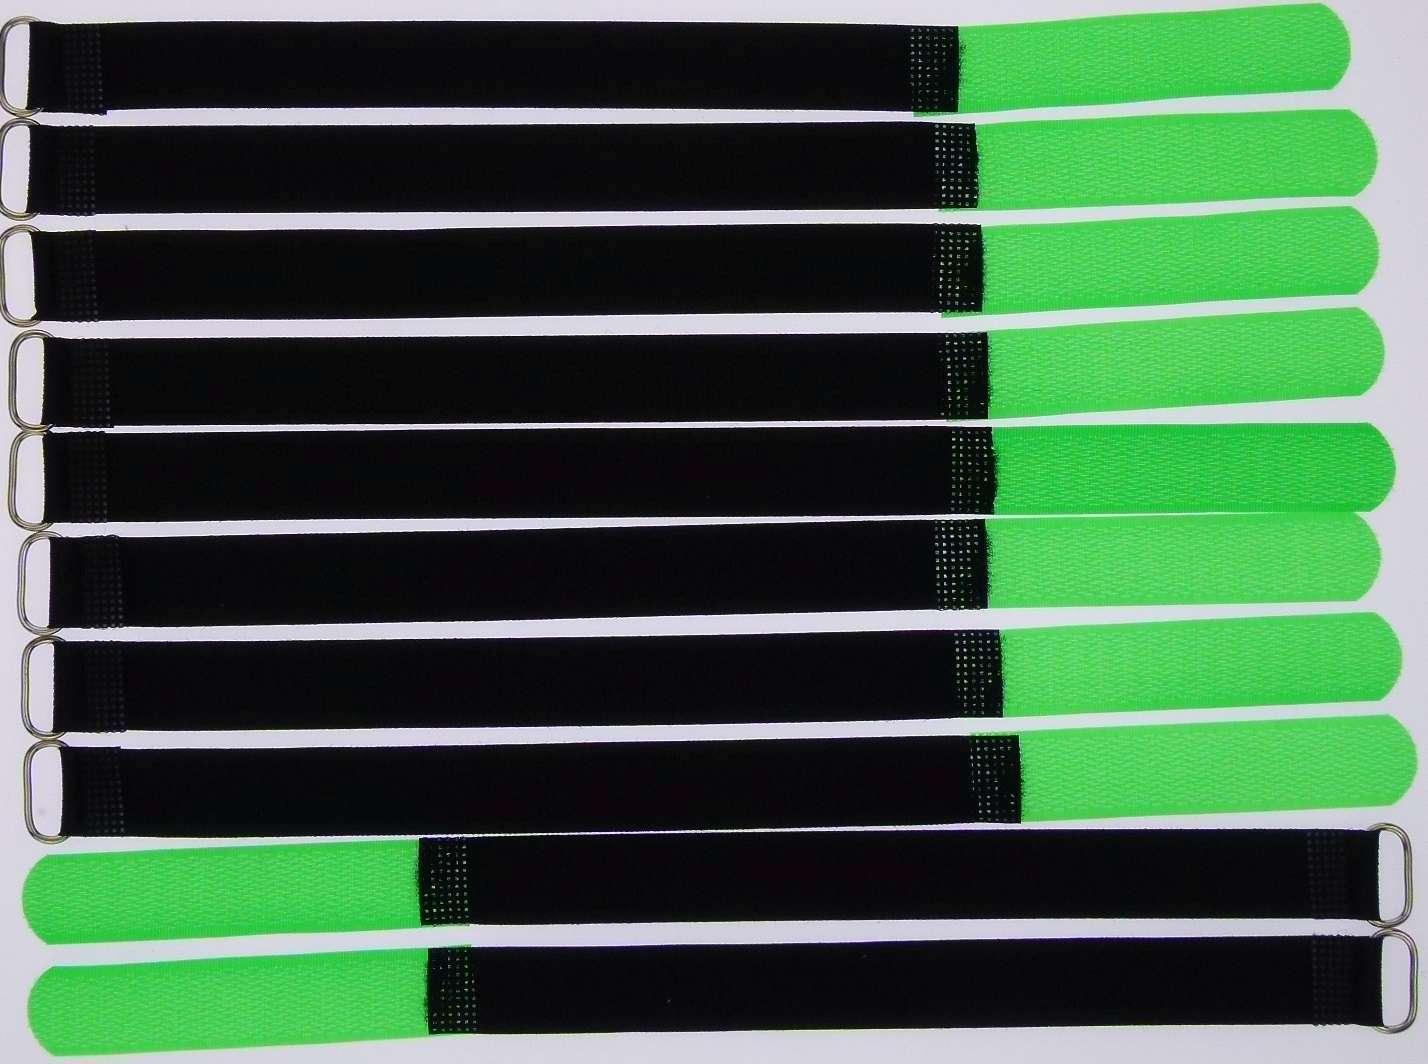 10x Kabelklettband 30cm x 20mm dunkel-grün Metallöse Kabelbinder Kabel-Klettband